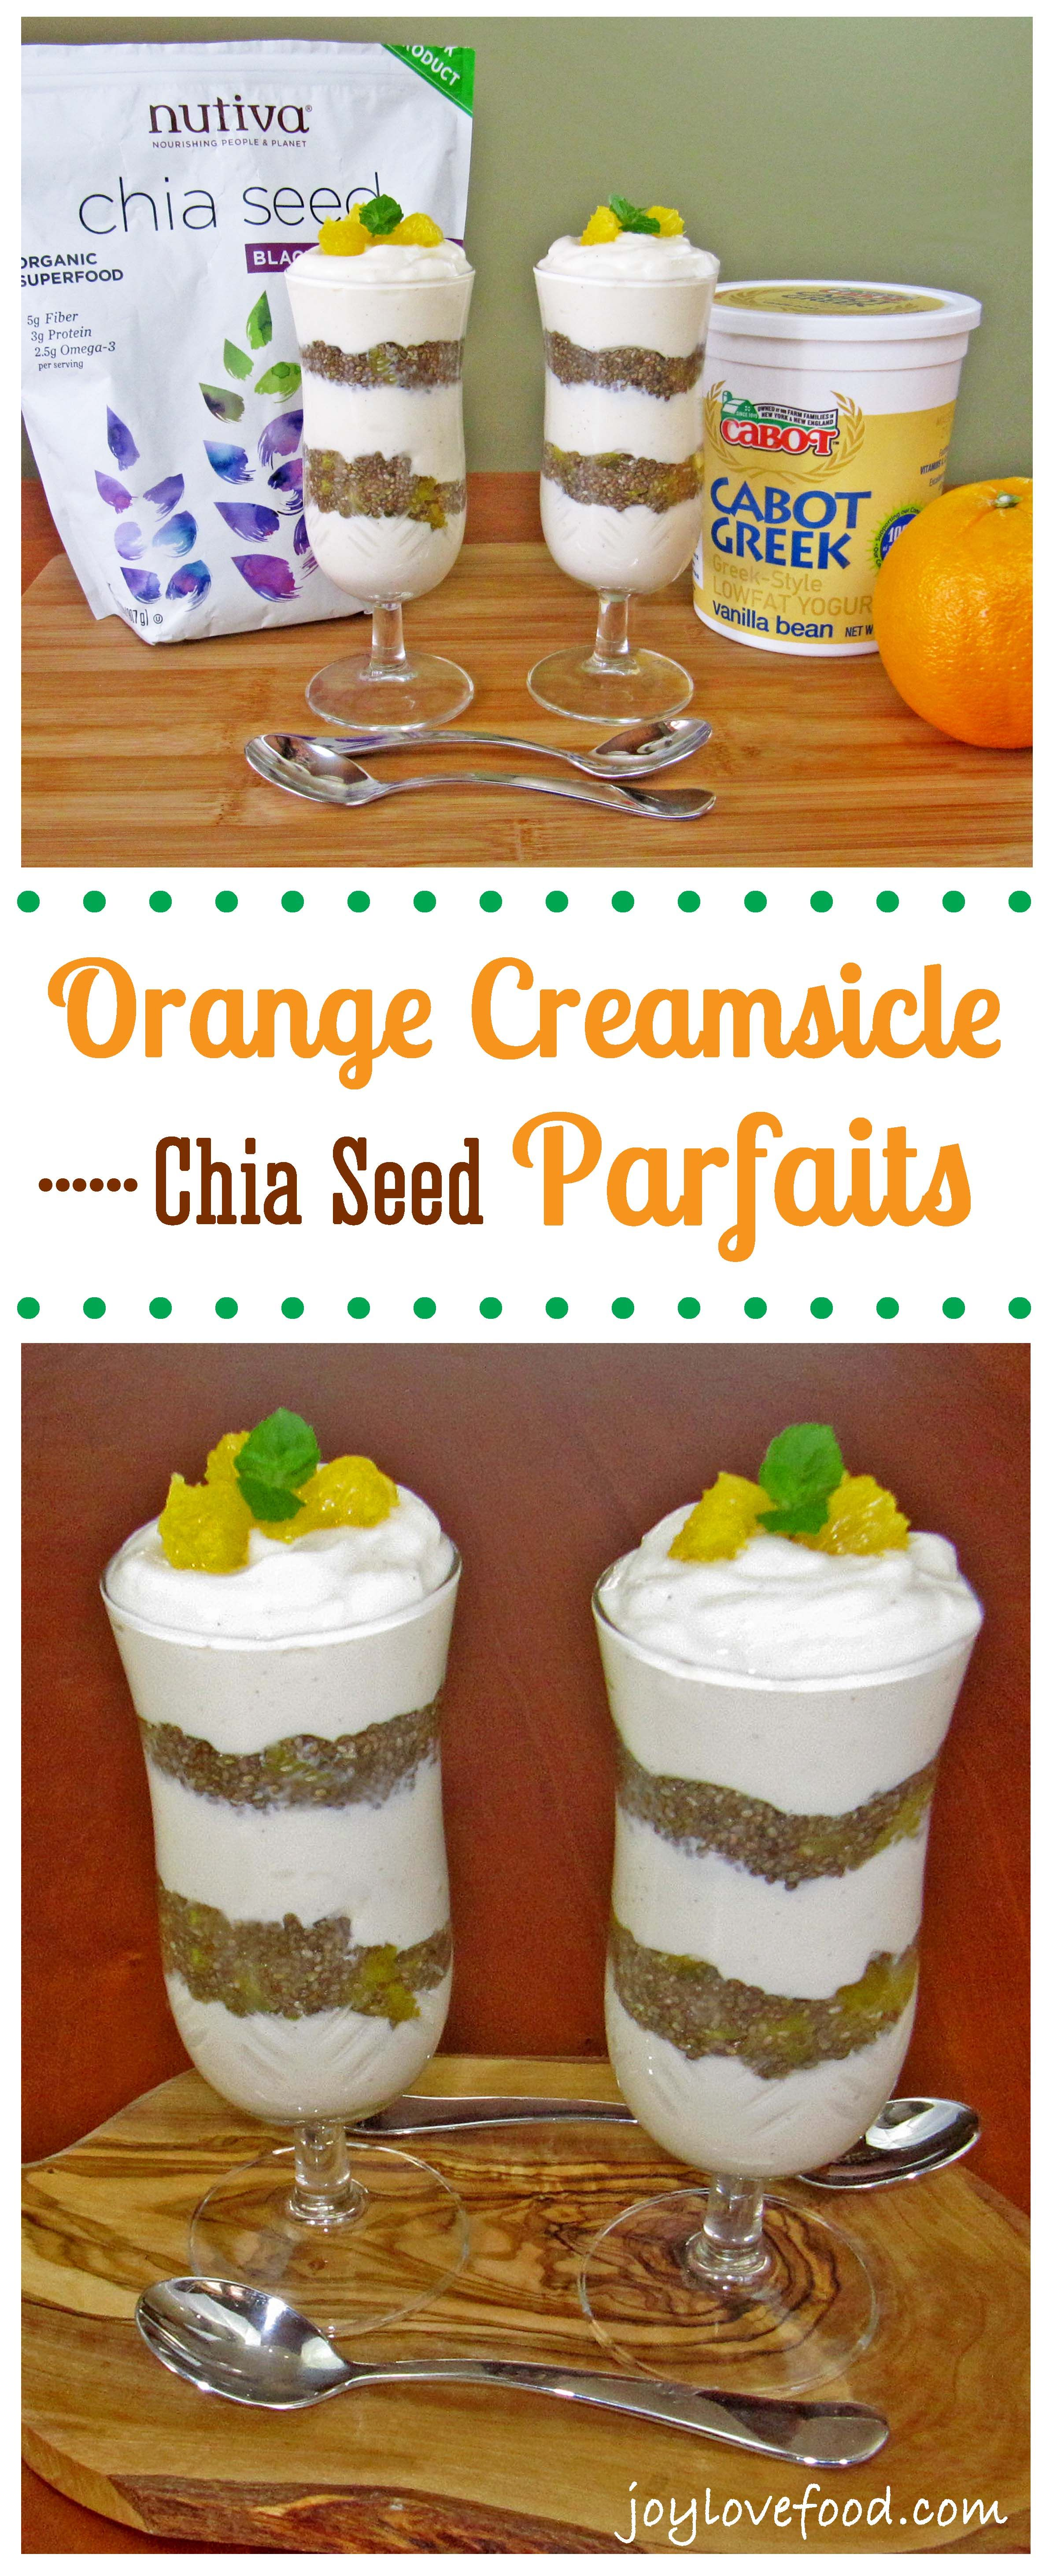 Orange Creamsicle Chia Seed Parfaits